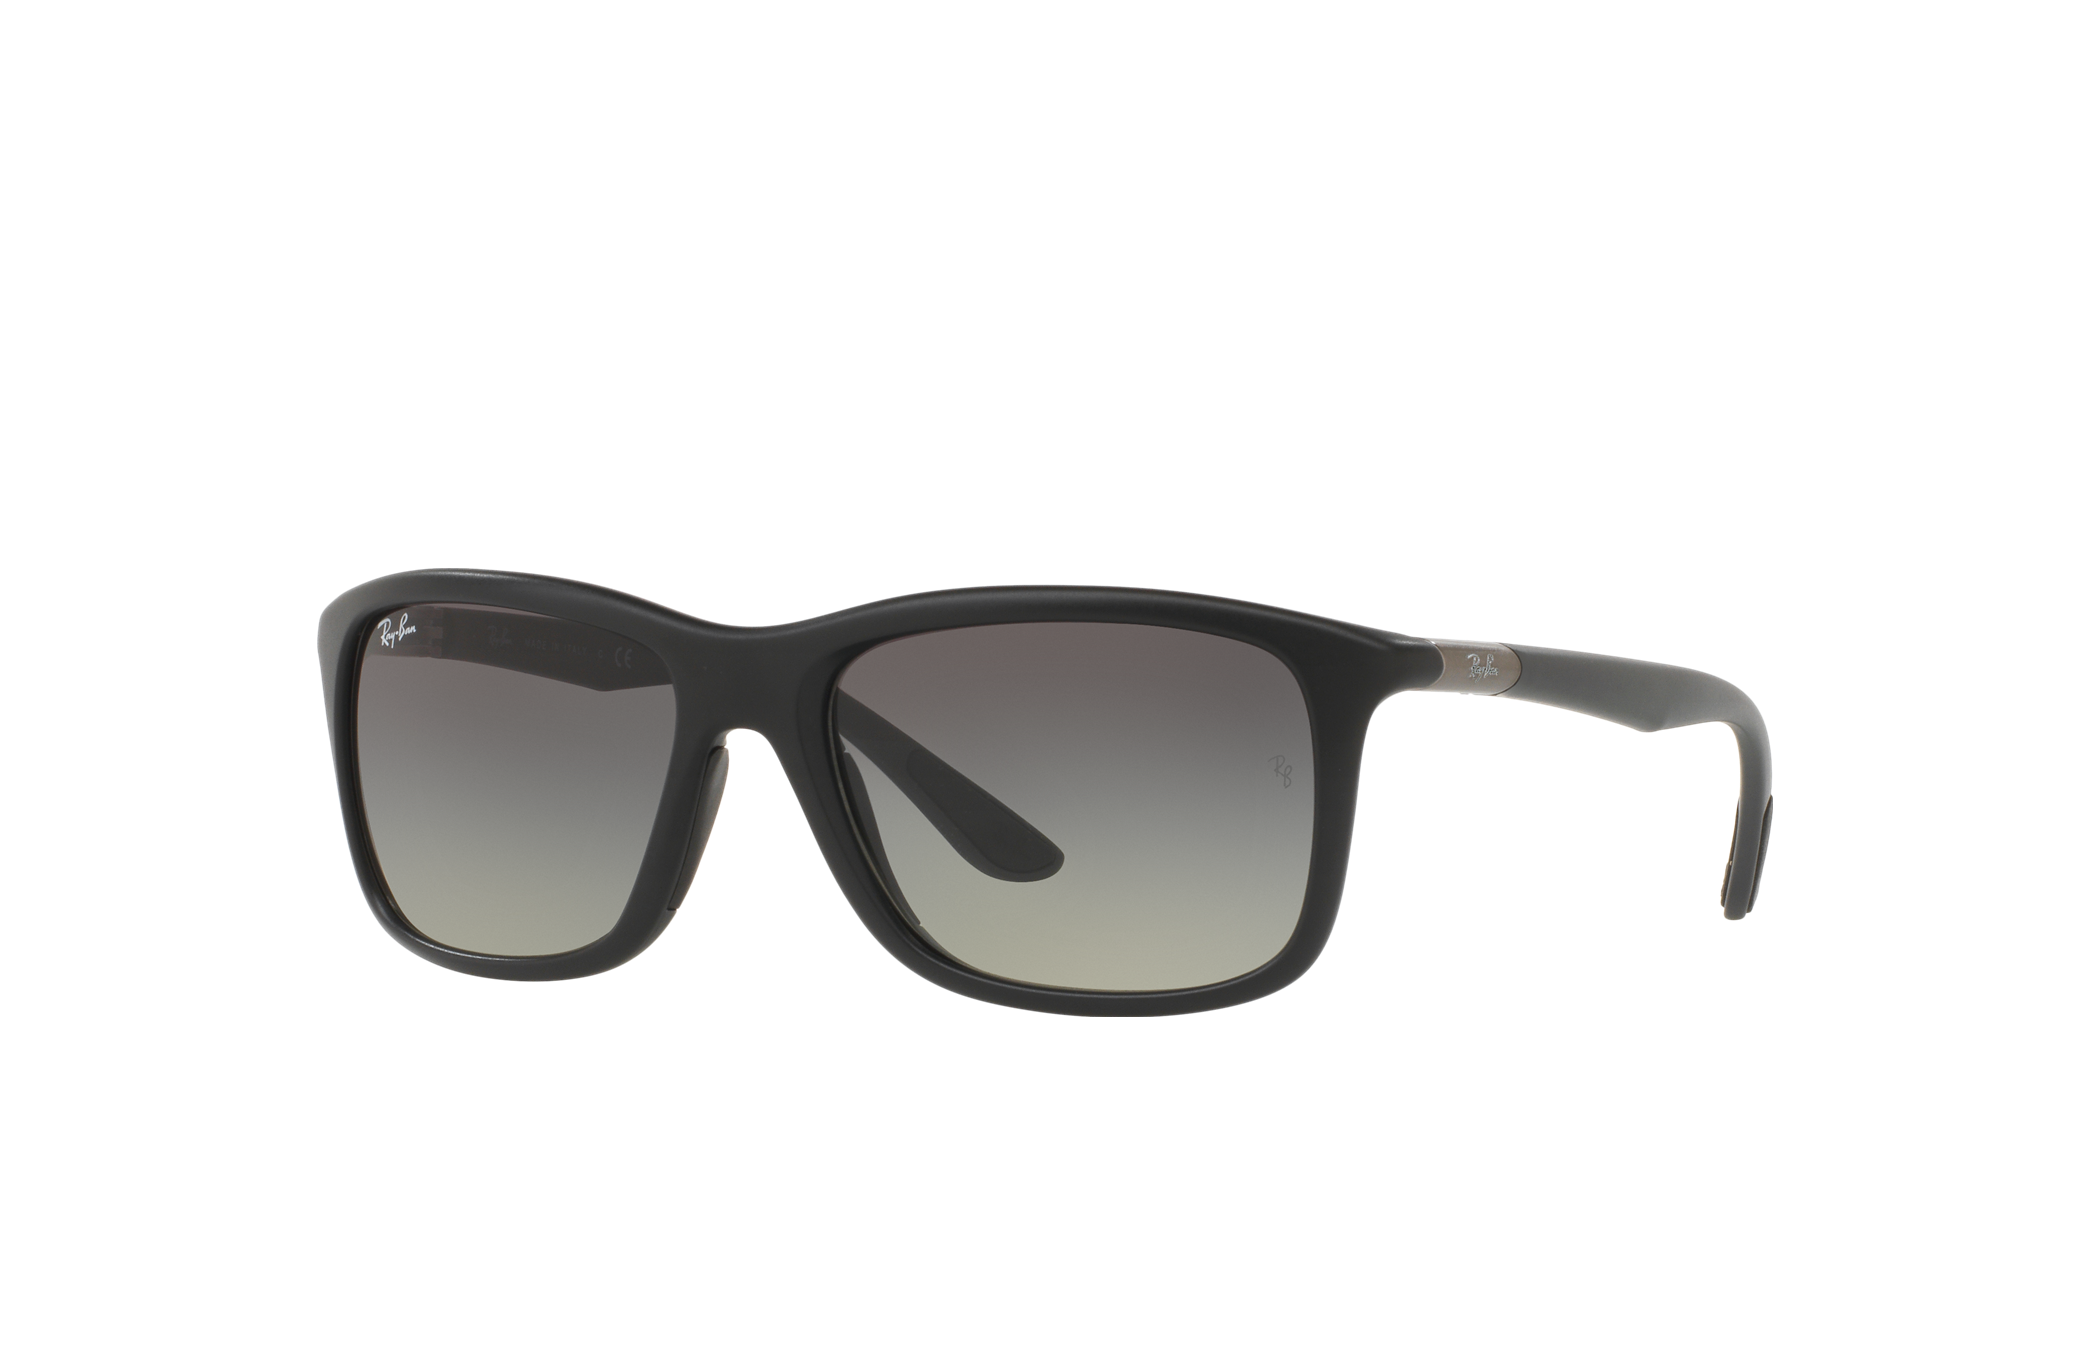 Ray-Ban Rb8352 Grey, Gray Lenses - RB8352